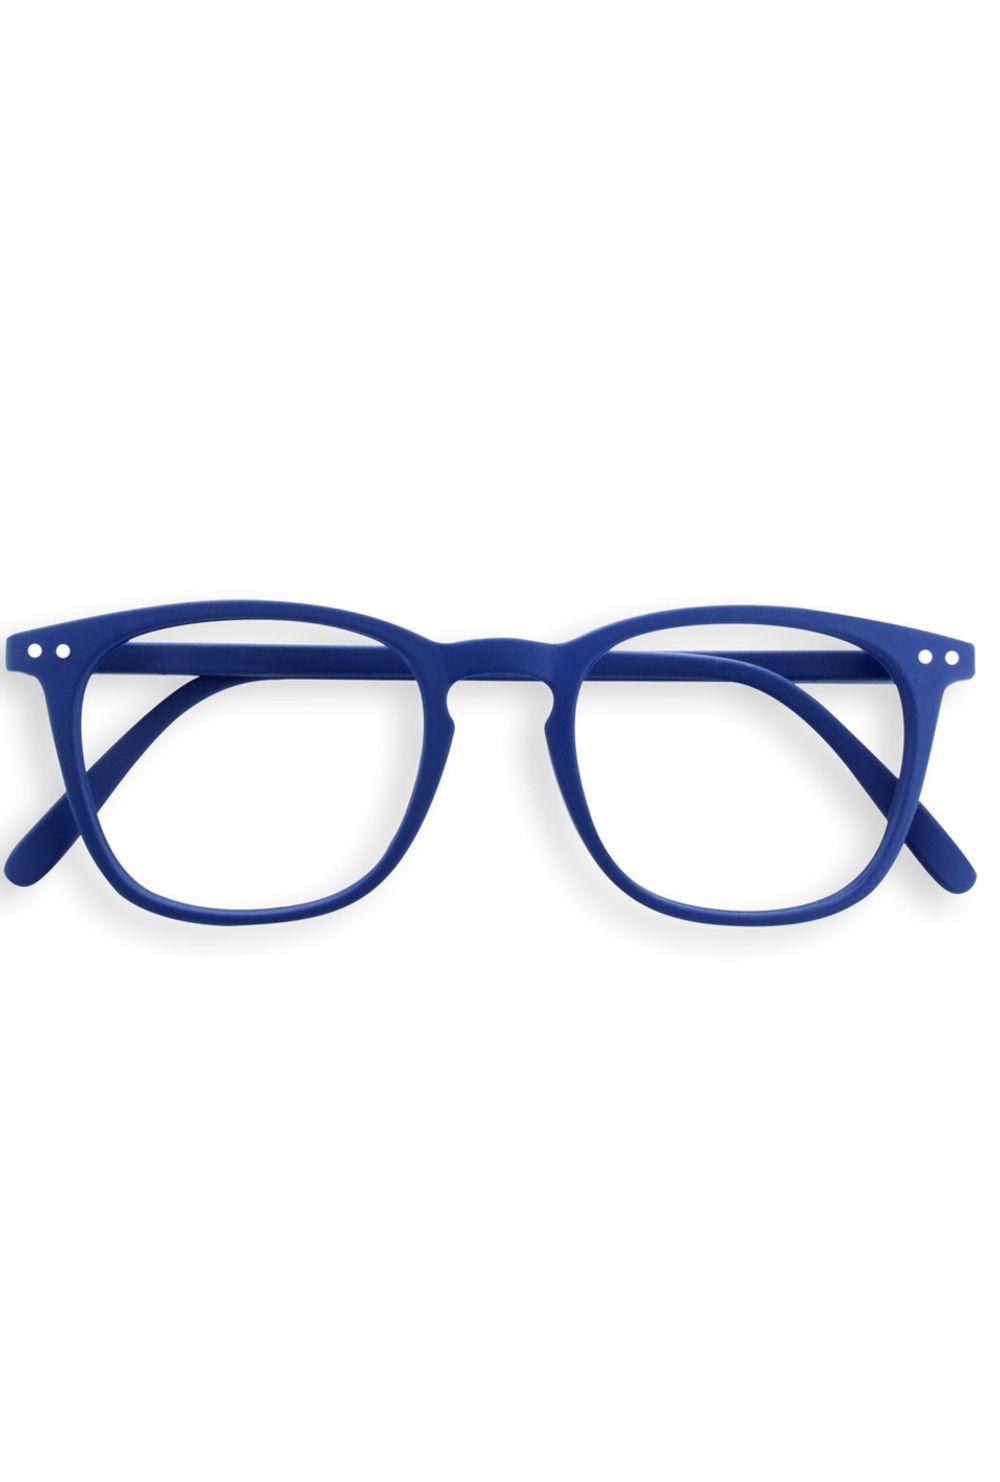 95414aa99f5a6 Óculos Reading D Navy Blue Izipizi - Mobile